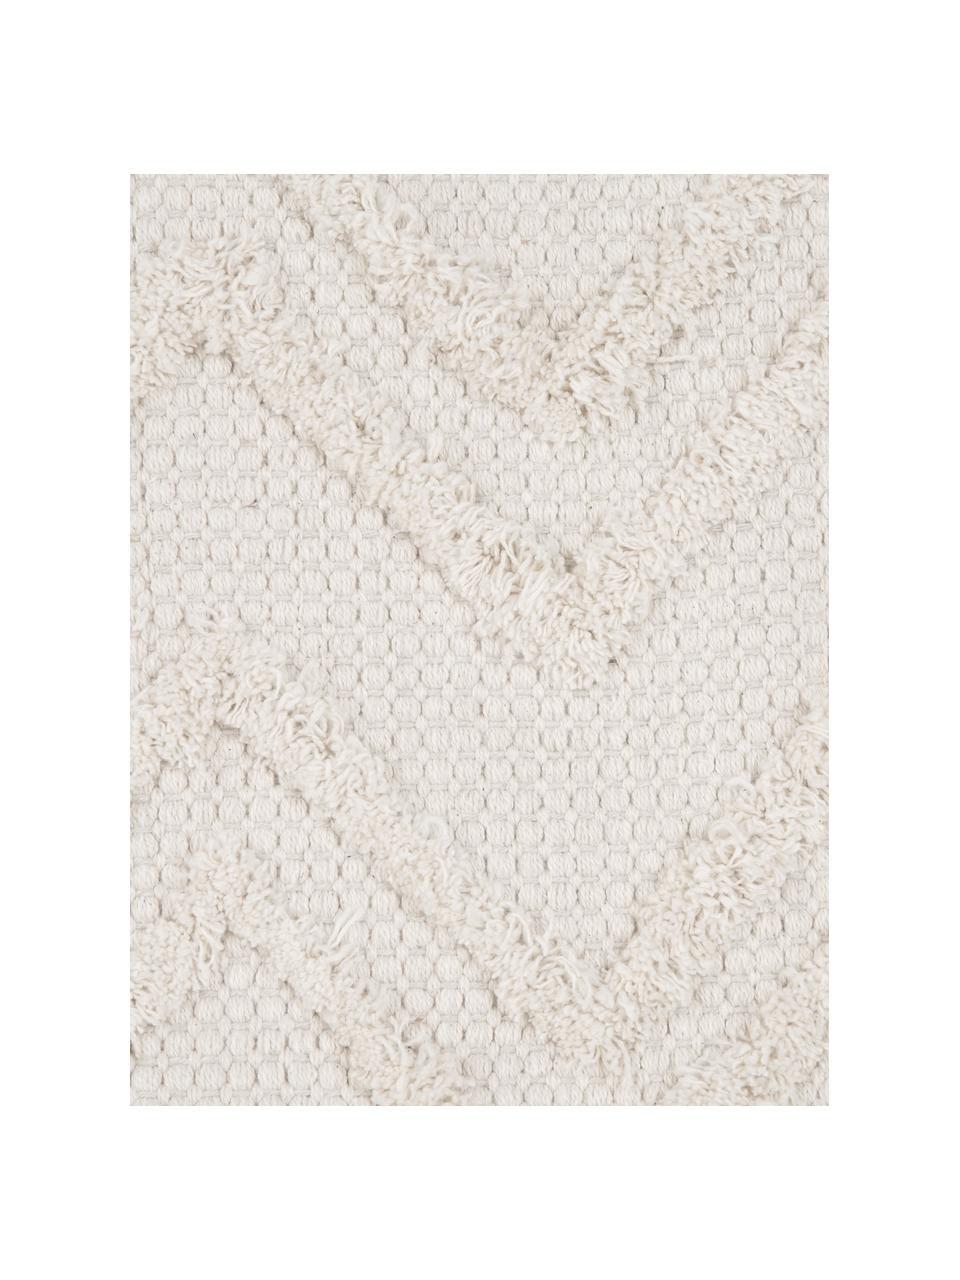 Federa arredo con motivo a zigzag  Akesha, 100% cotone, Ecru, Larg. 45 x Lung. 45 cm